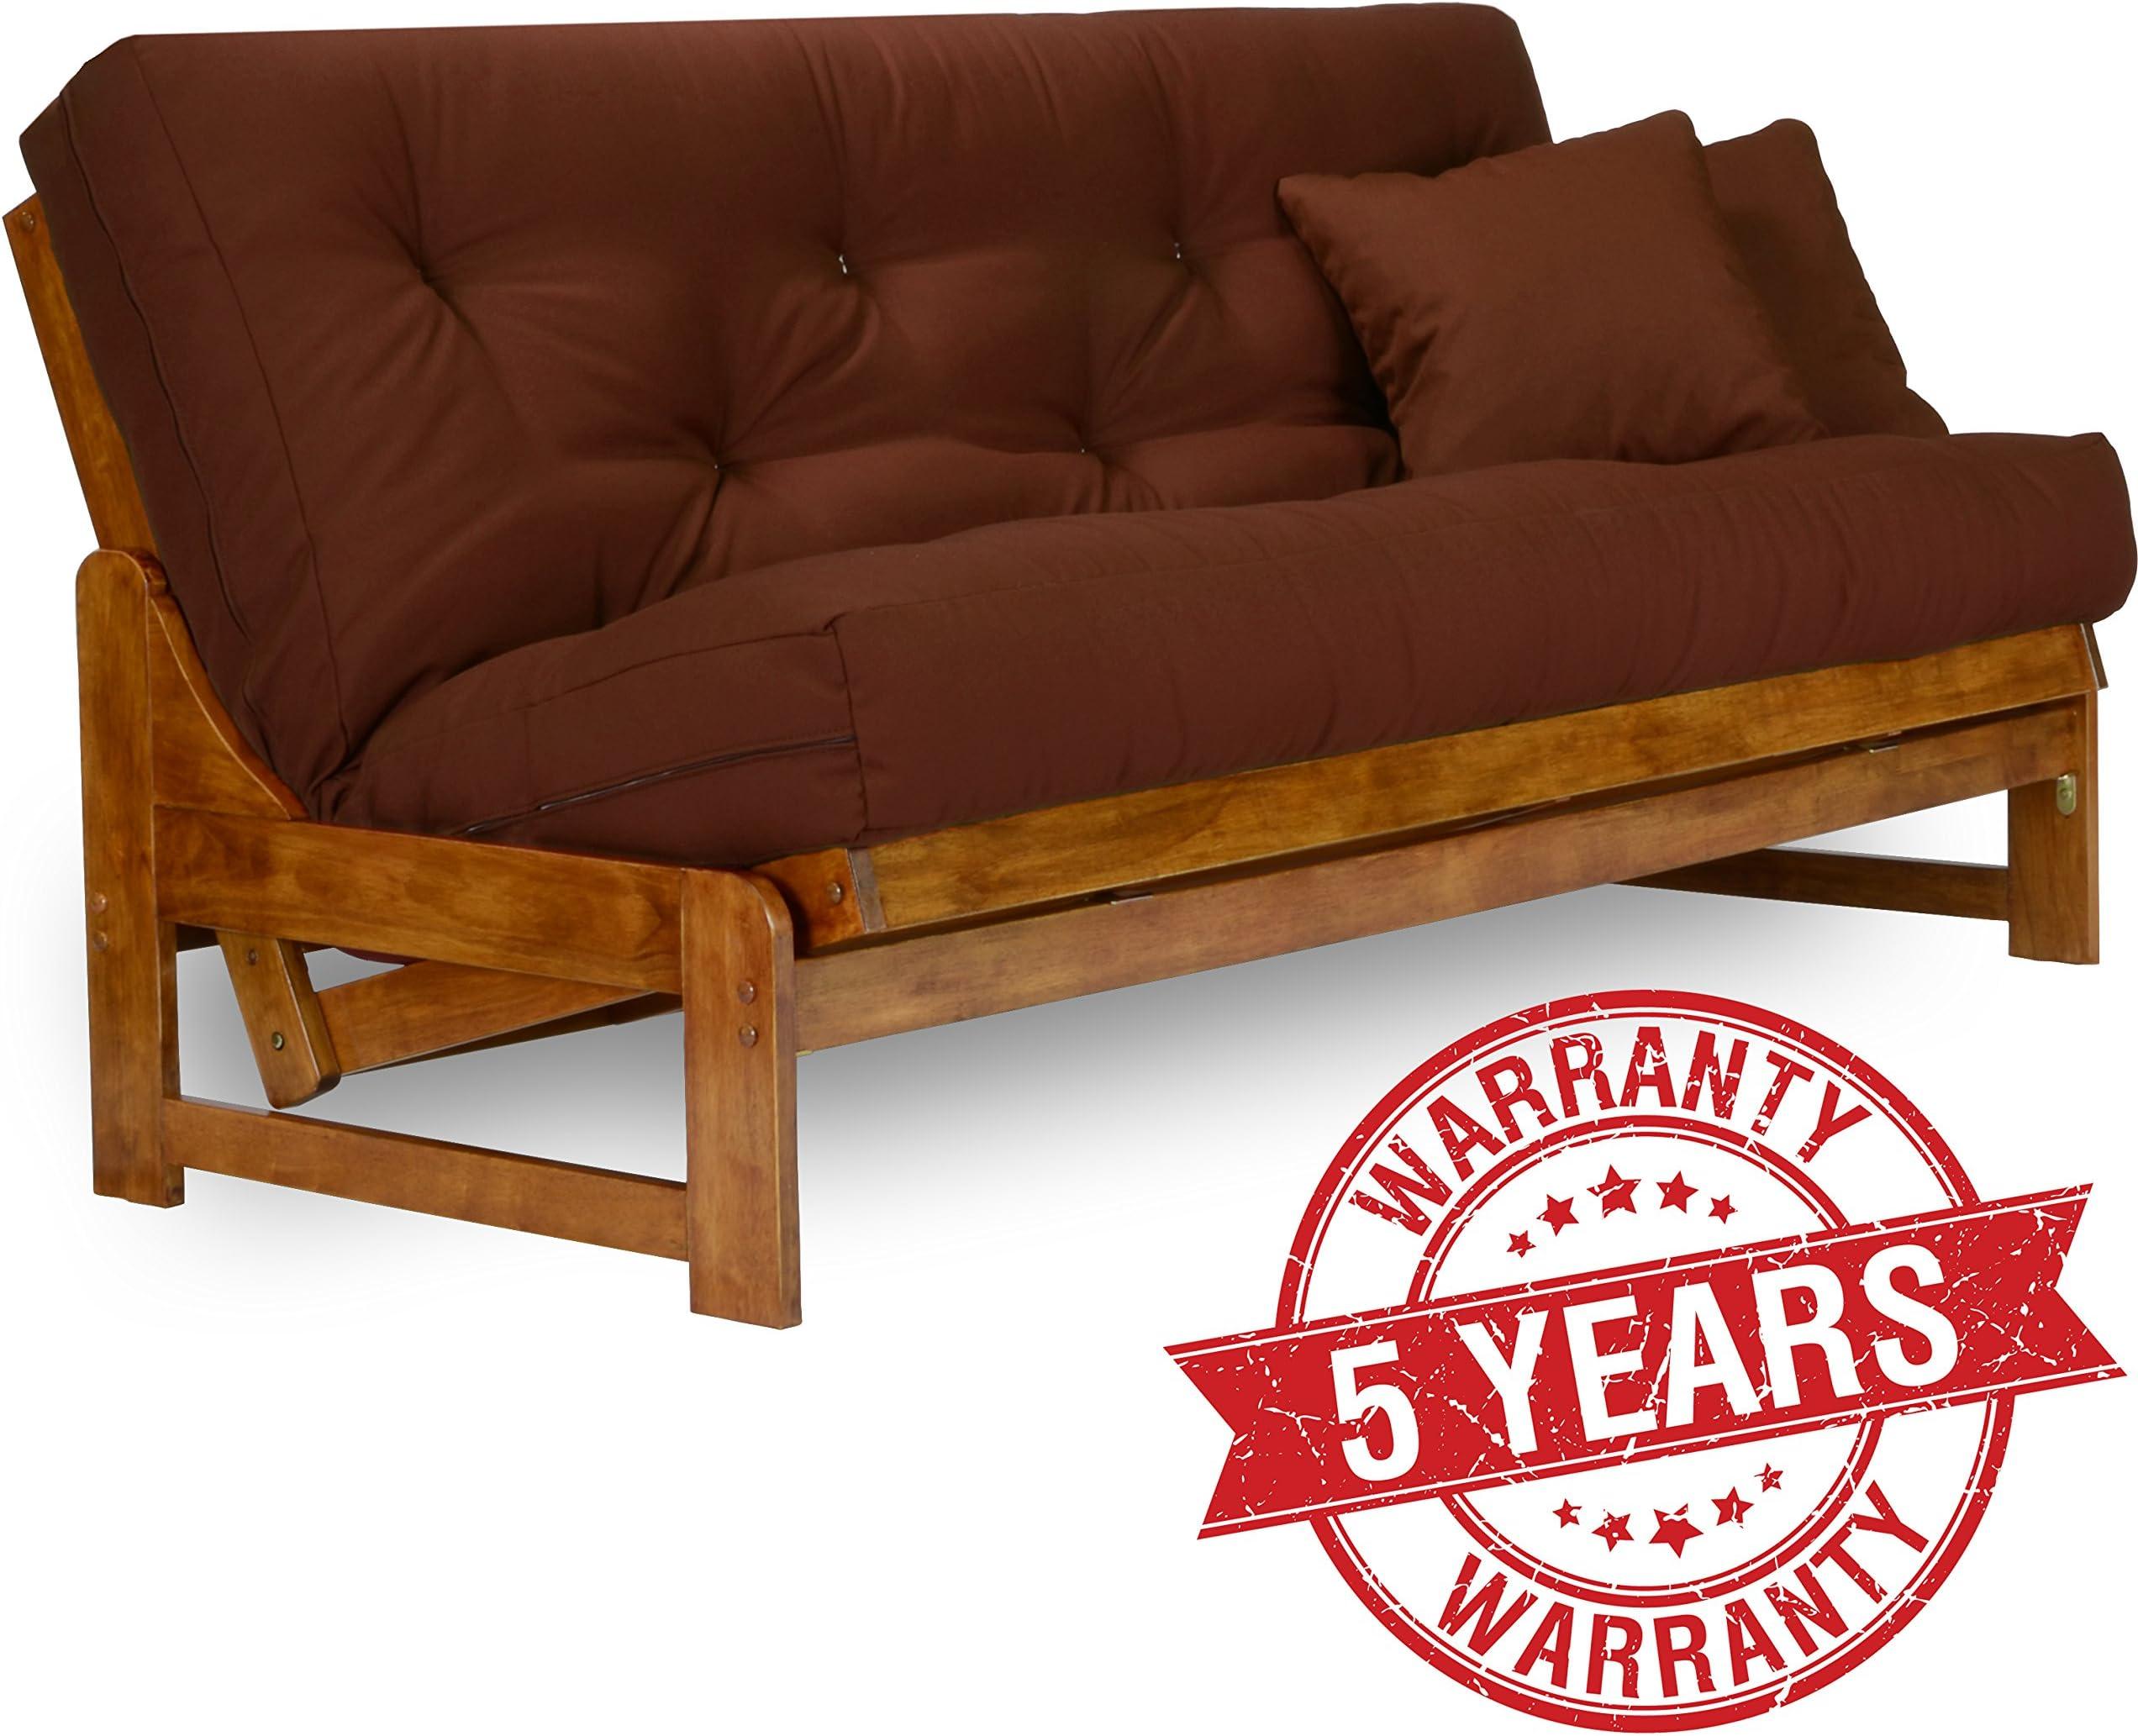 arden futon frame   queen size solid hardwood futons   amazon    rh   amazon